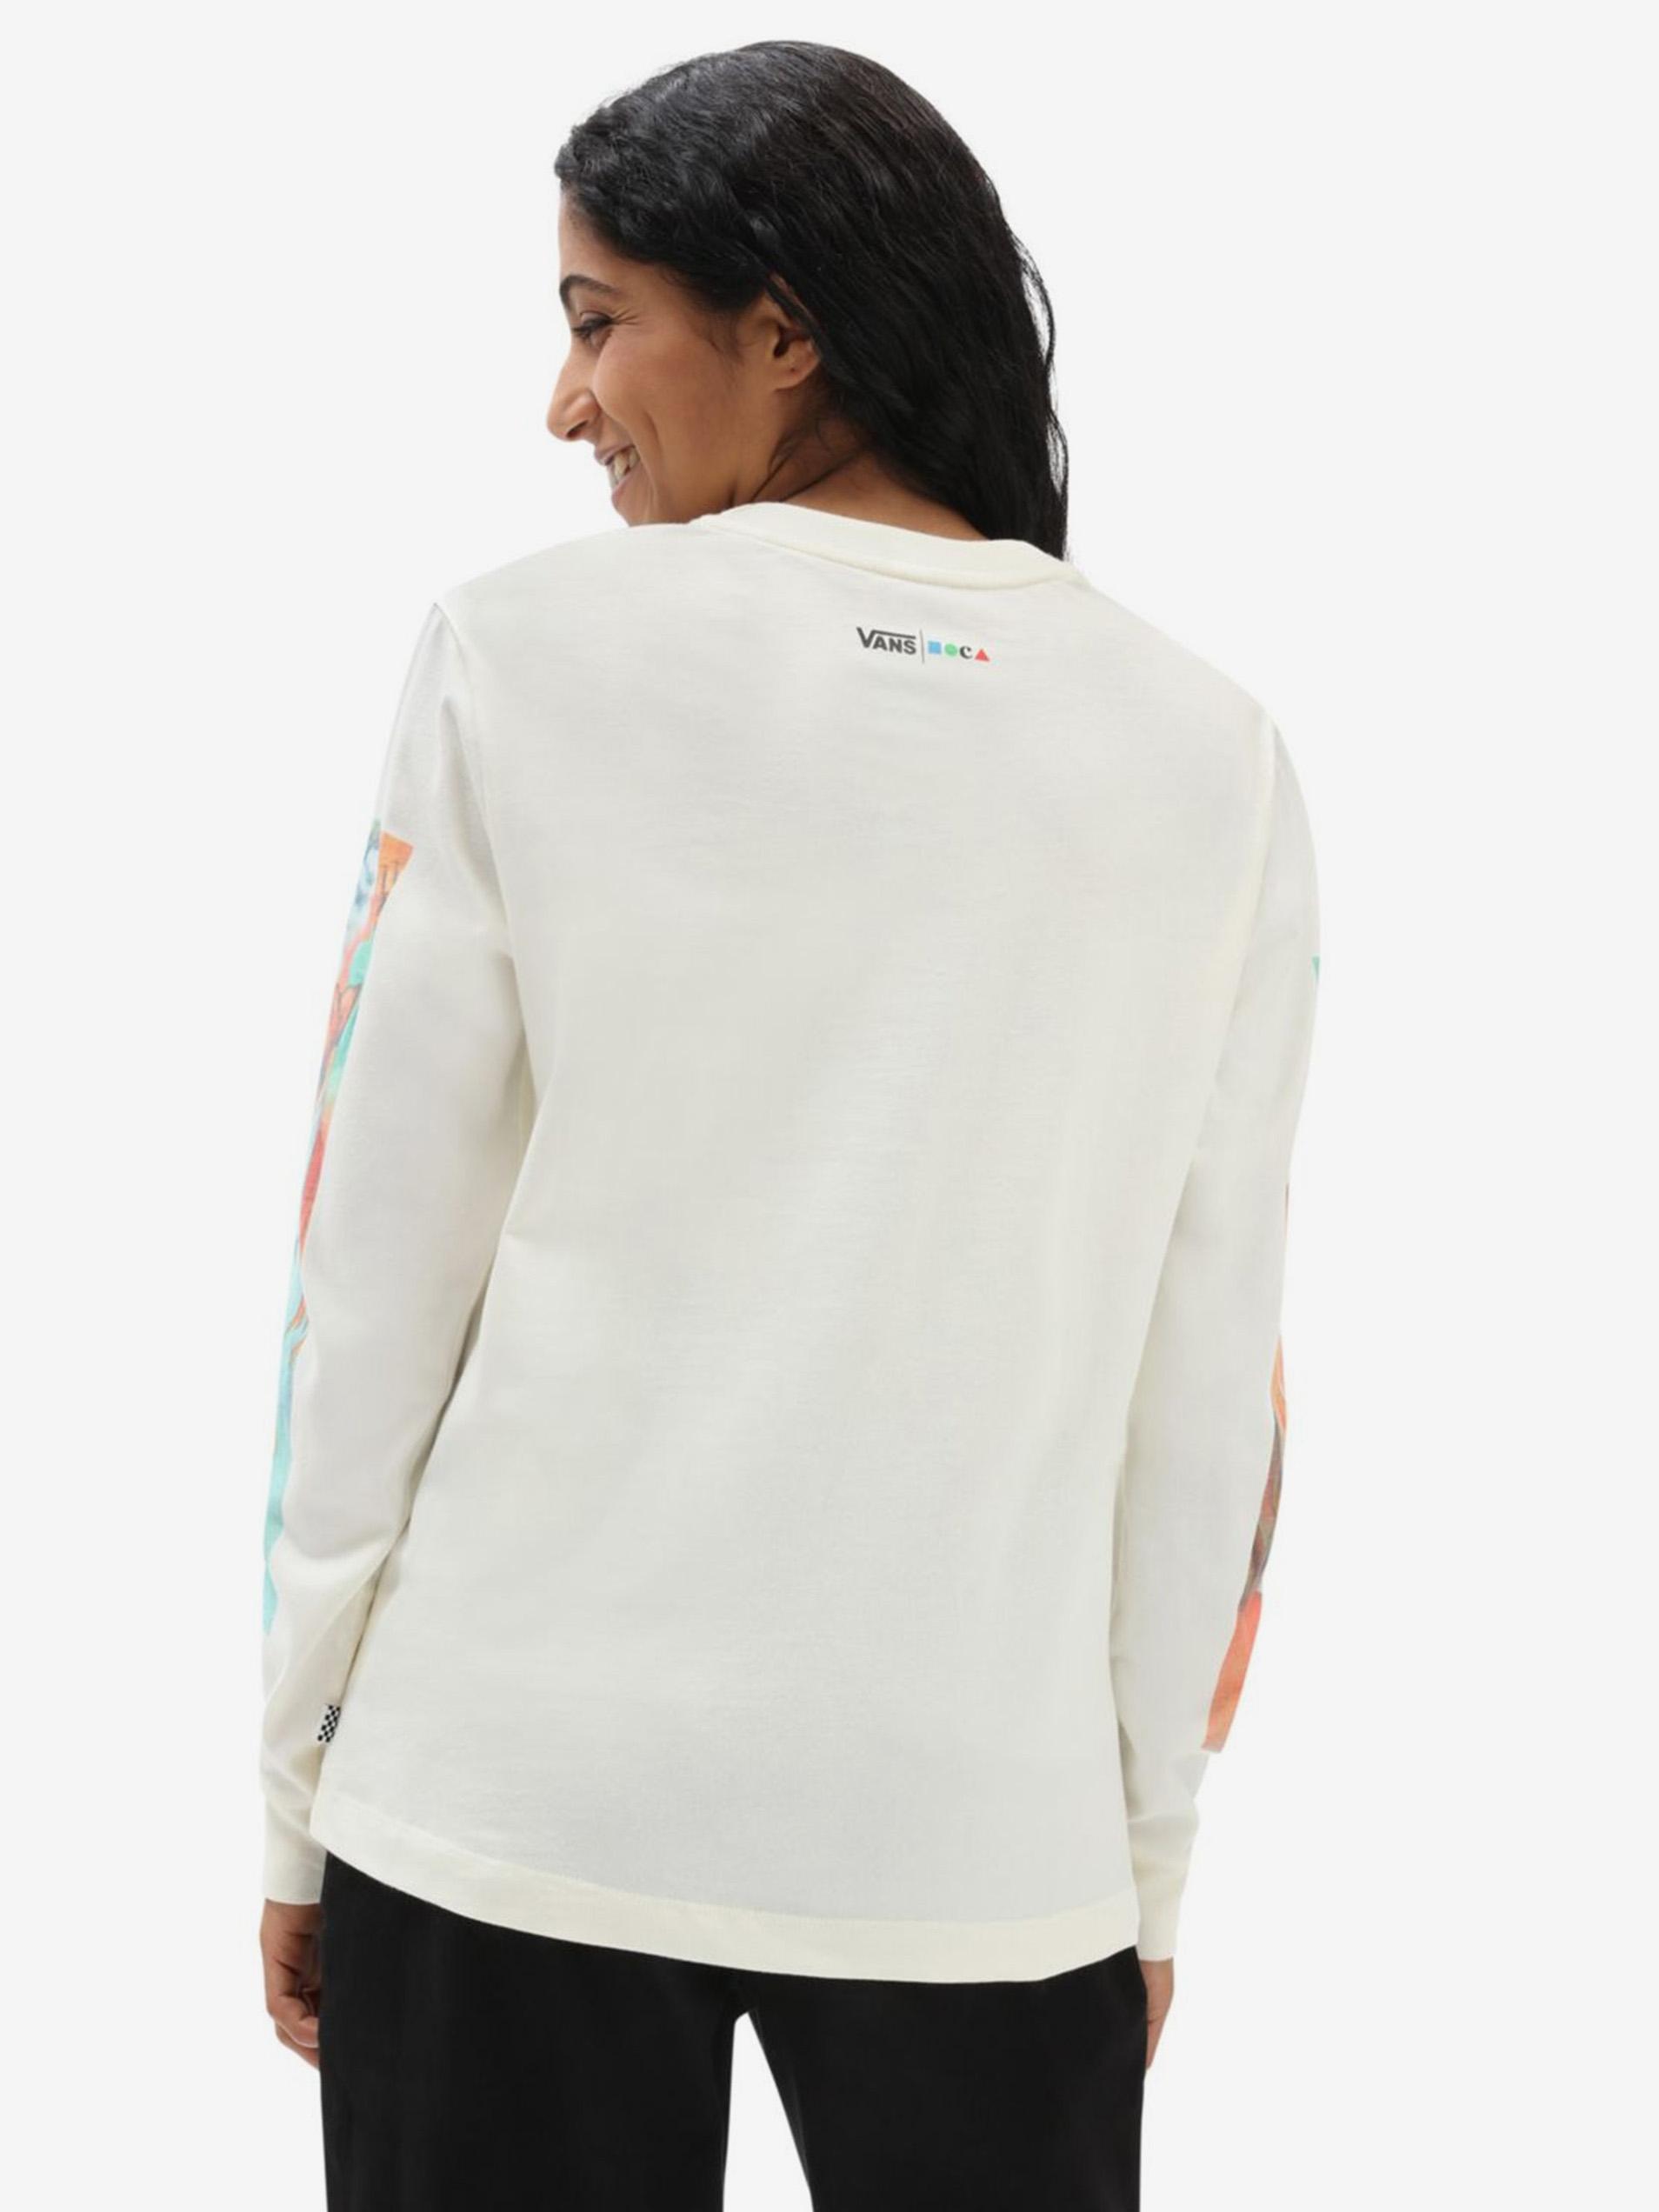 VANS Koszulka damska biały  Moca